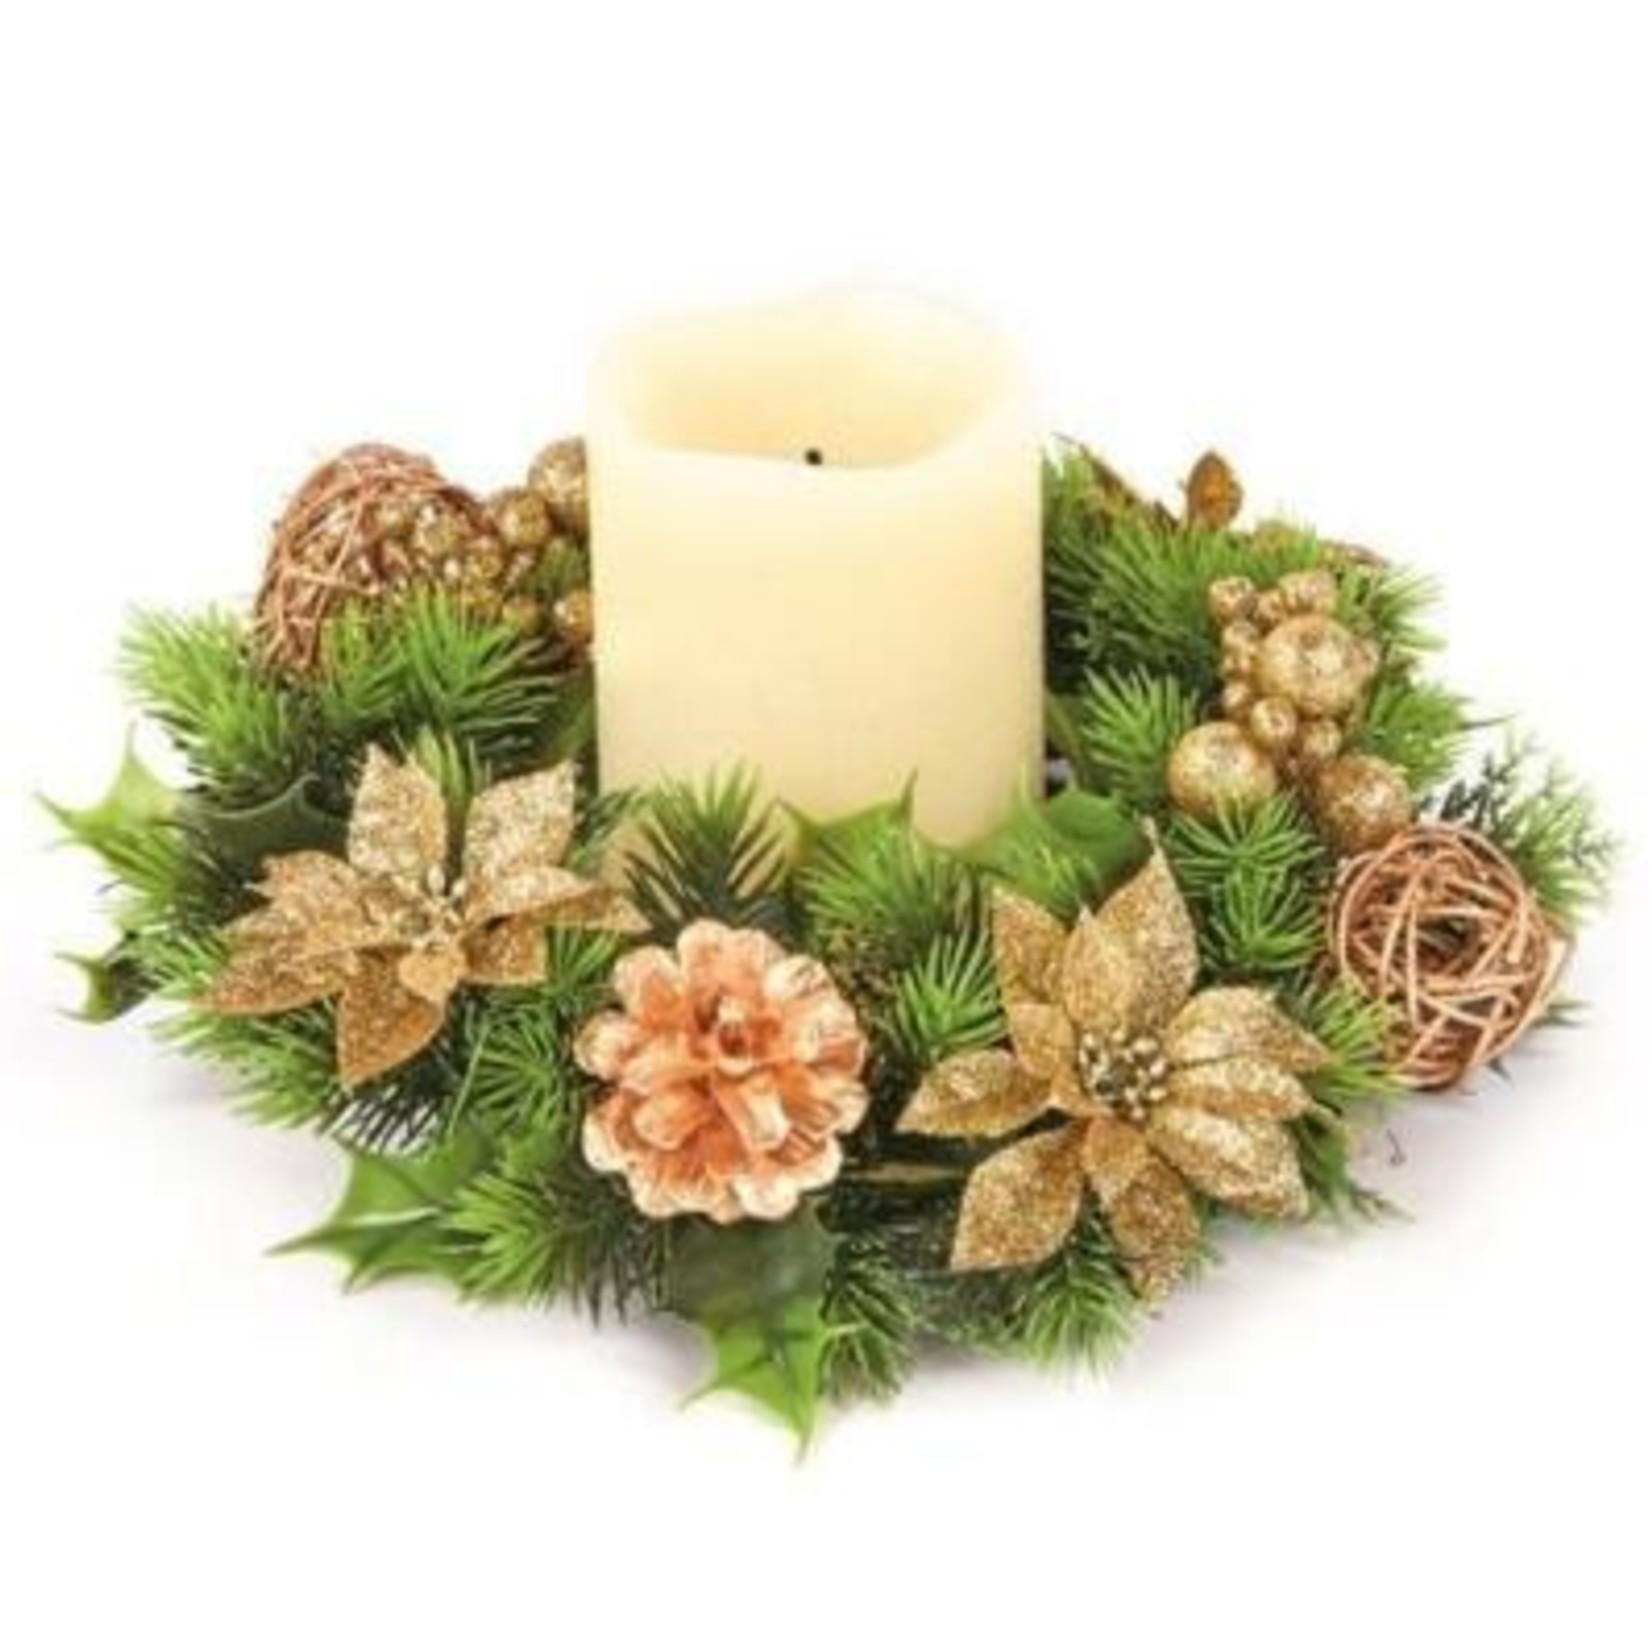 Premier 30CM Poinsettia Candle Wreath Gold